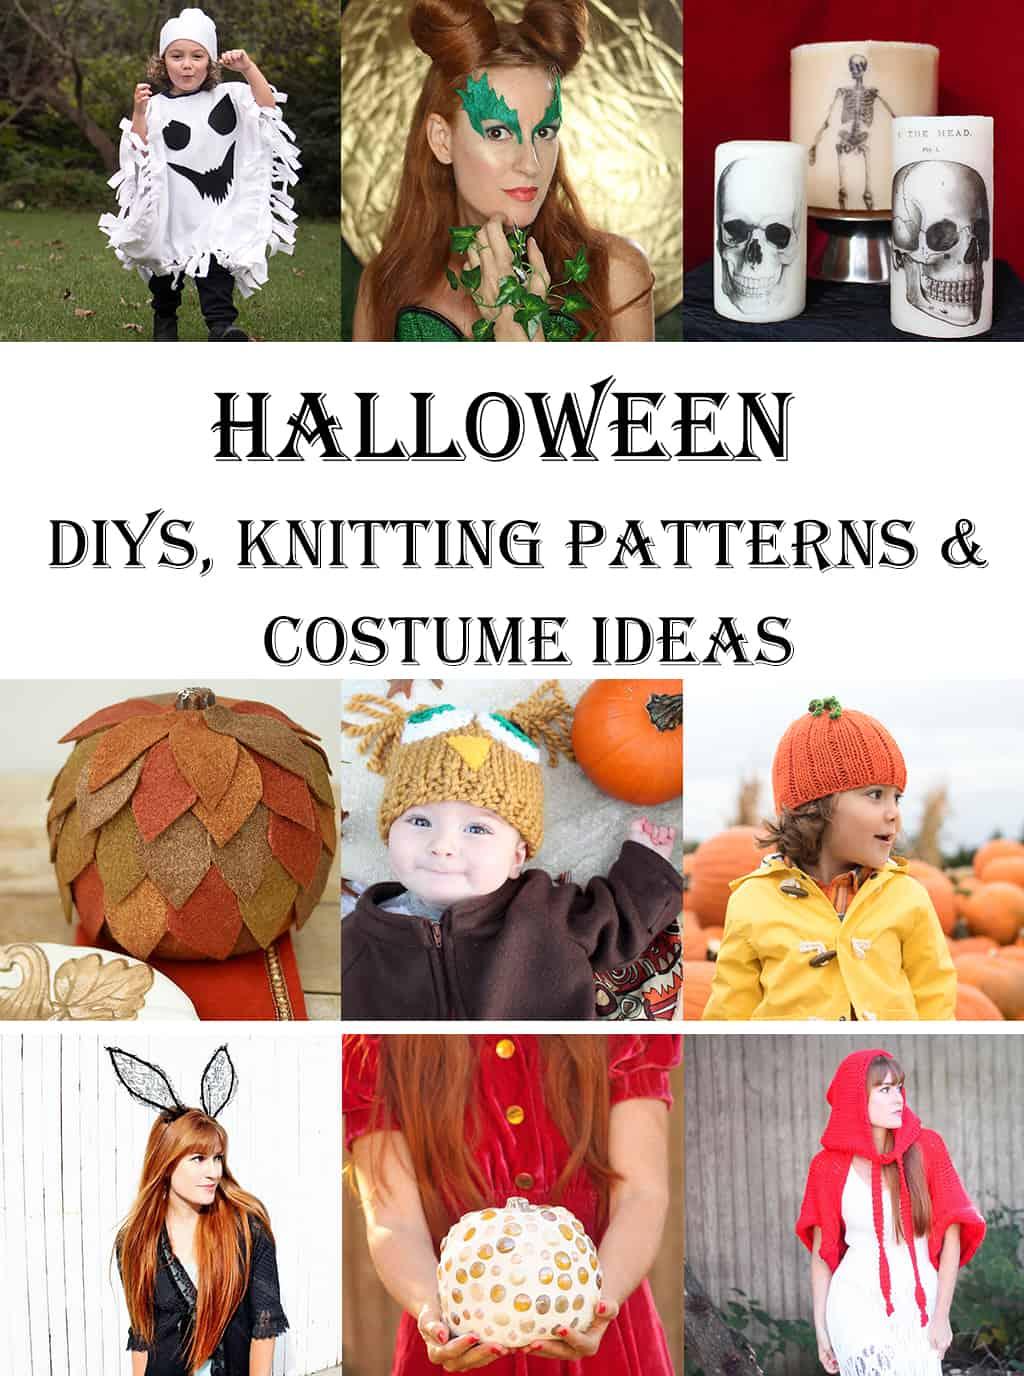 18 Halloween DIYs, Knitting Patterns and Costume Ideas - Gina Michele